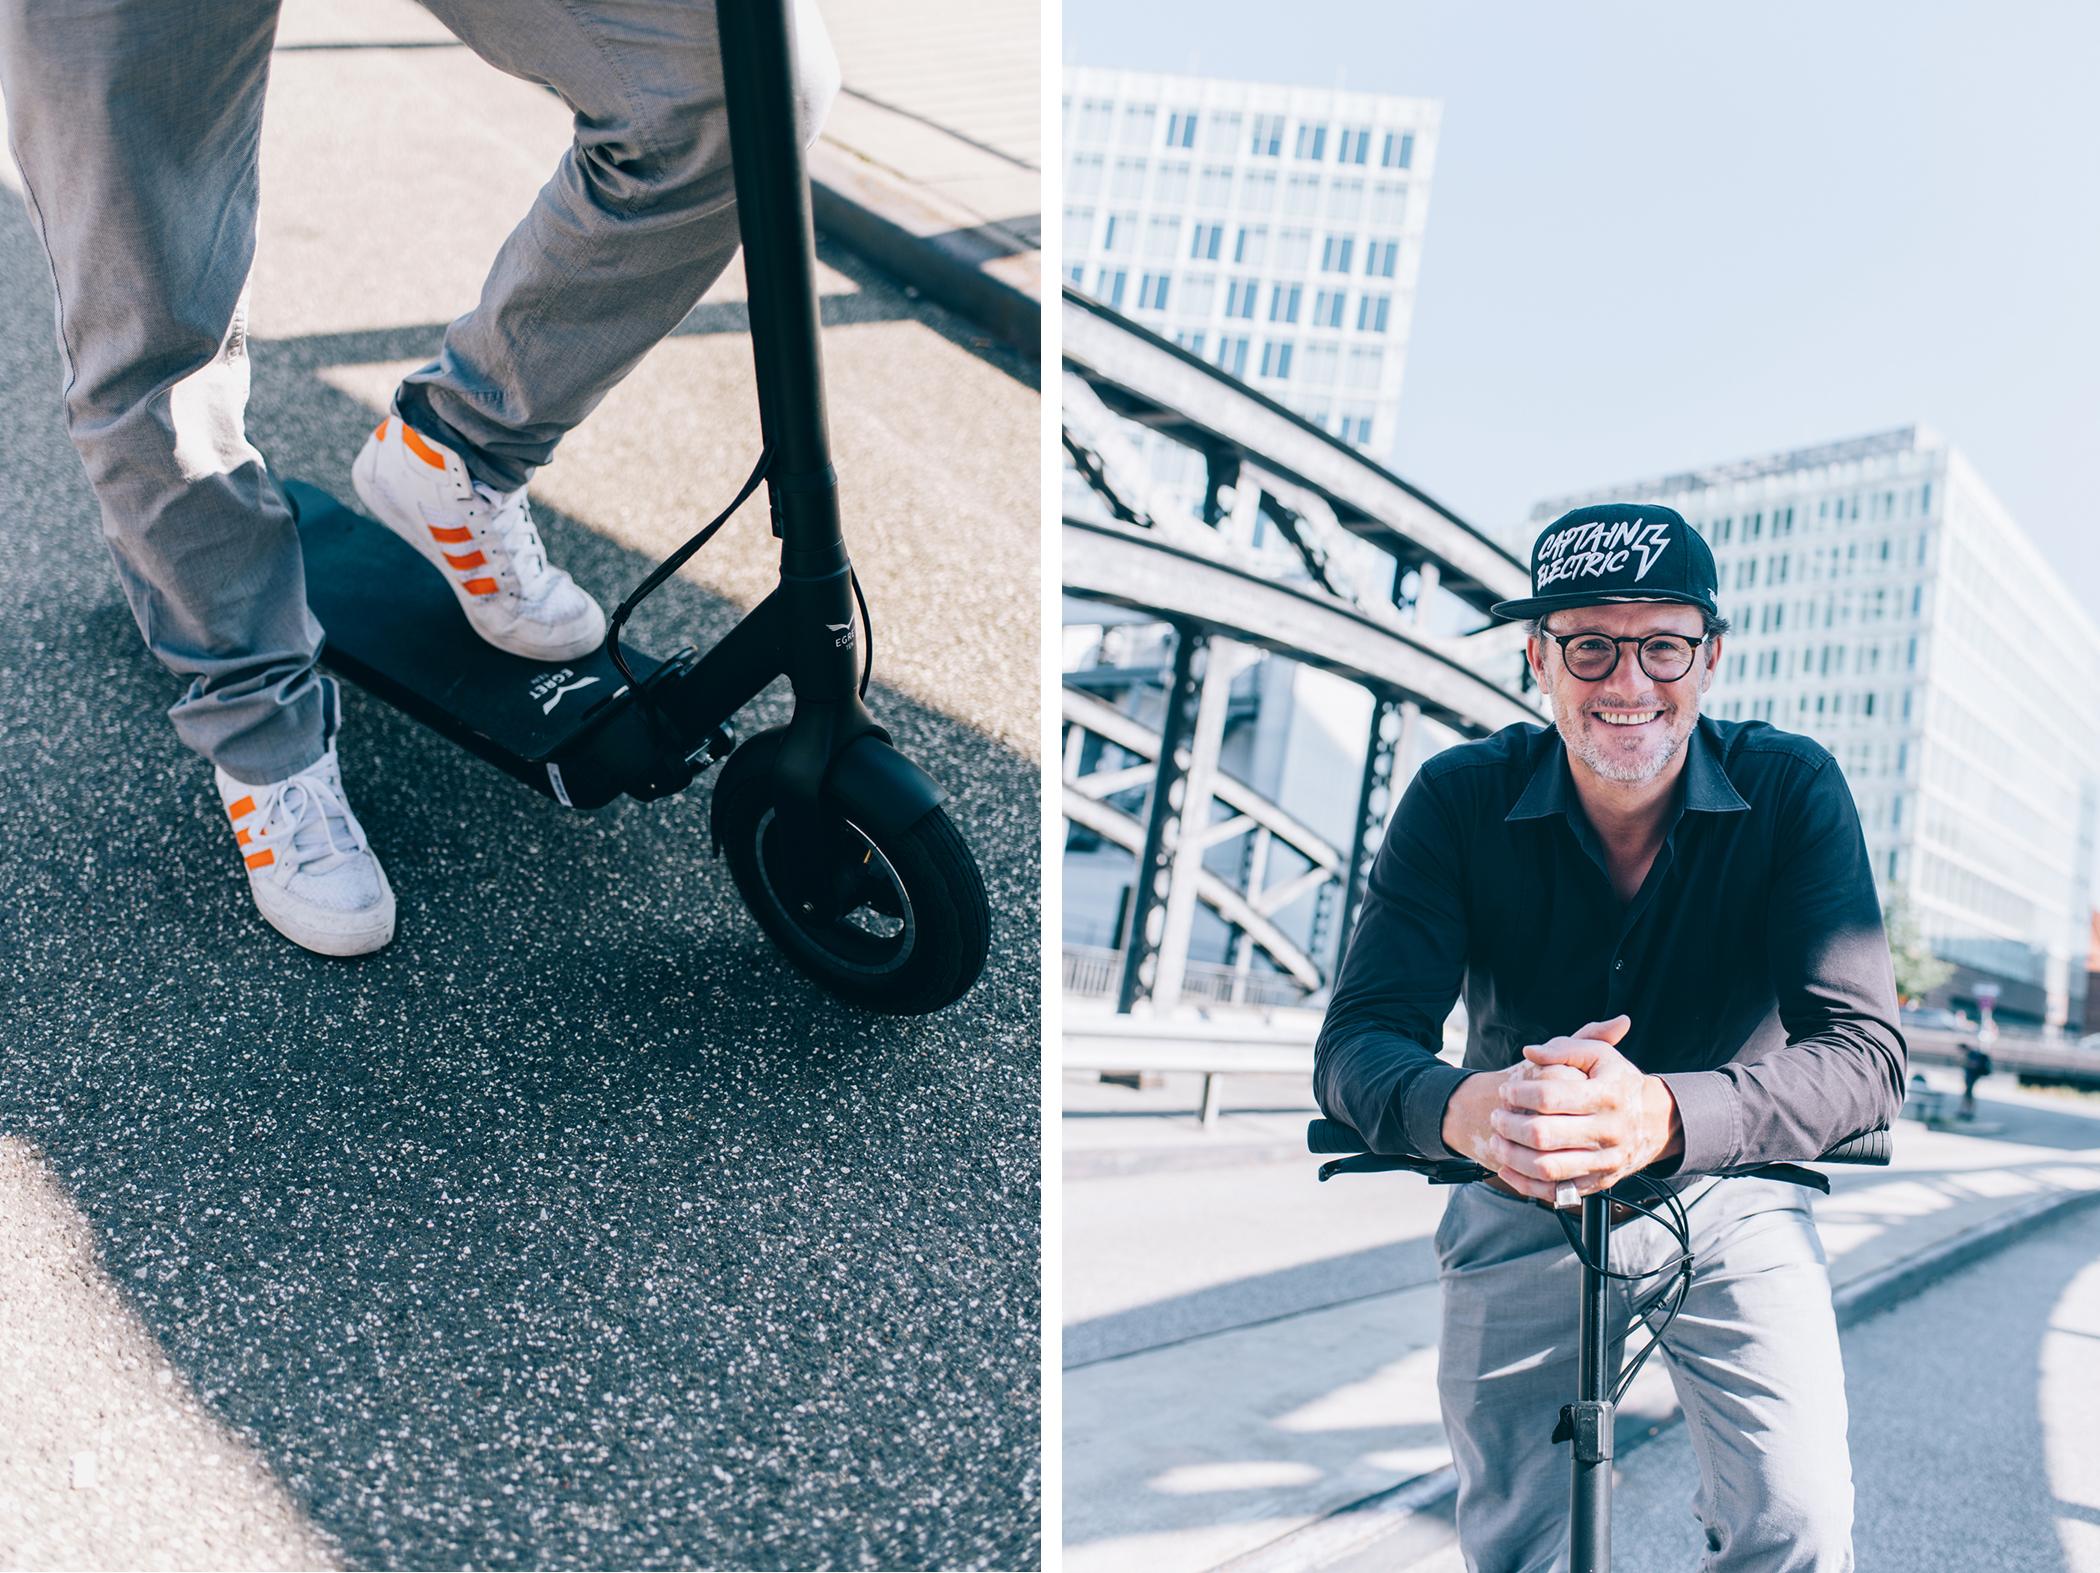 homtastics-Florian-Walberg-Urban-Electrics-Gruender